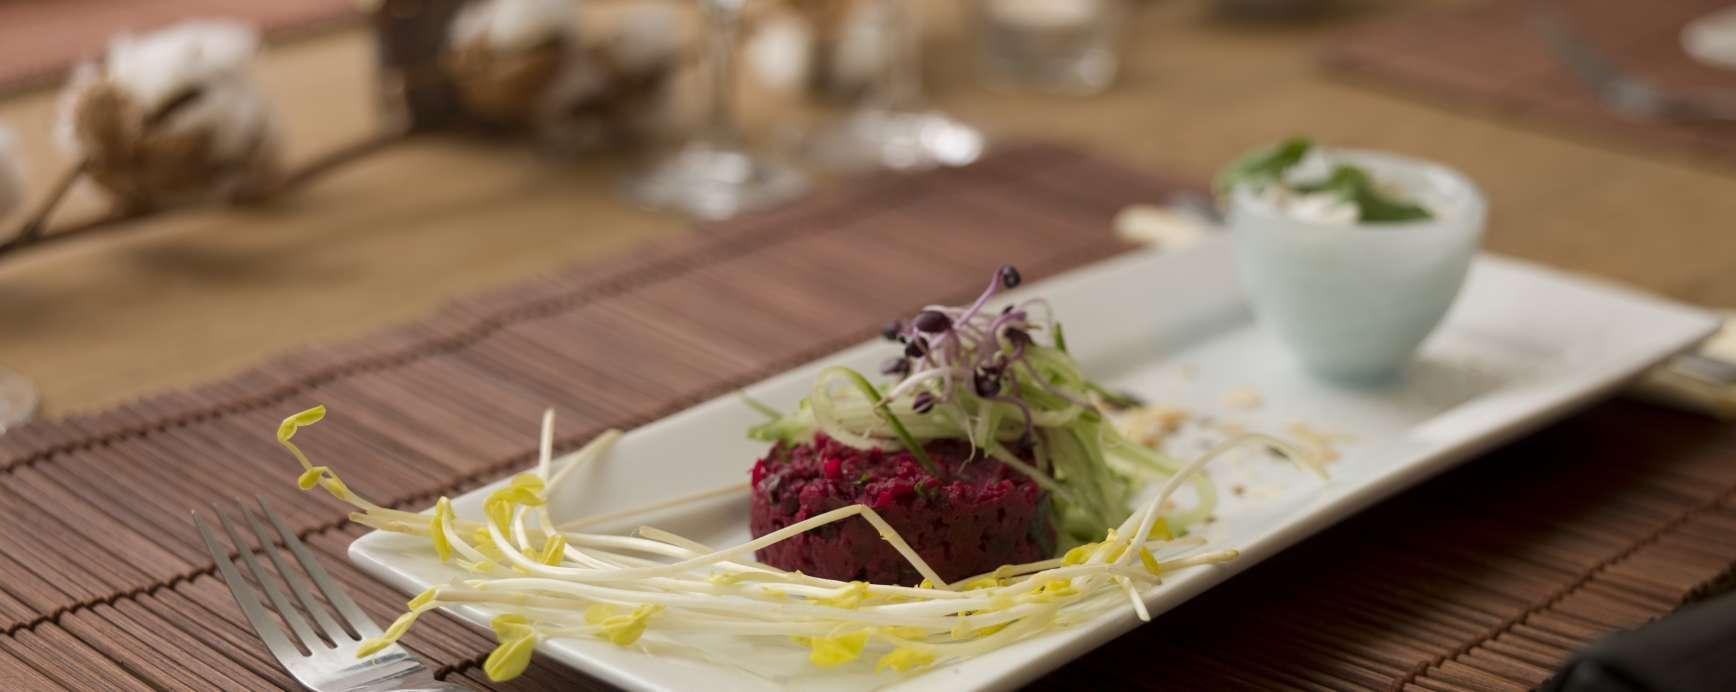 Rote Beete- Hummus